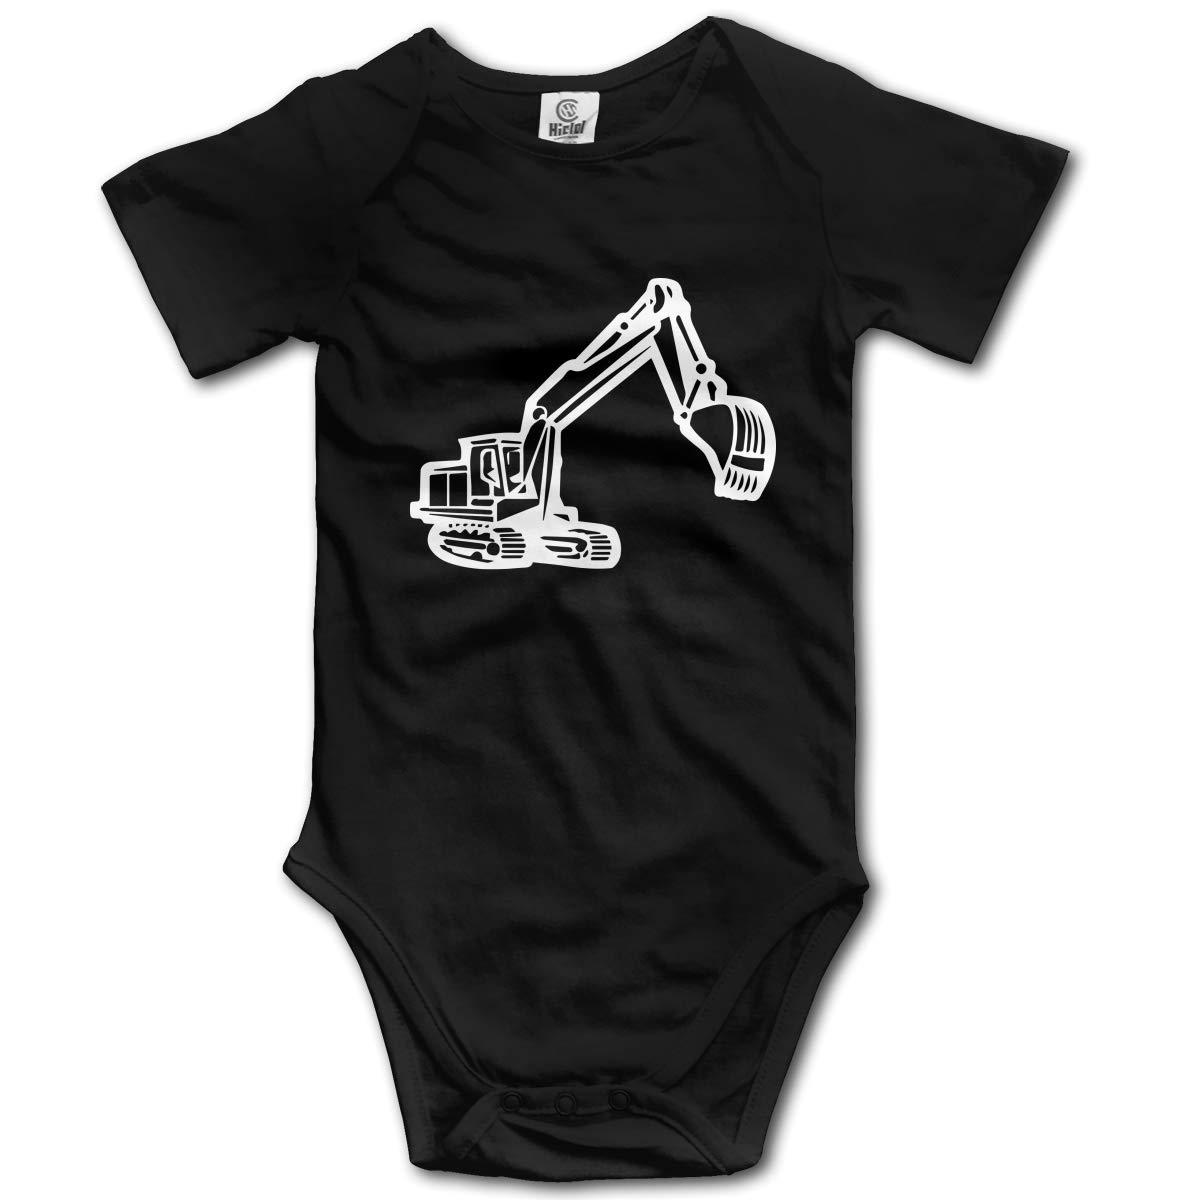 Digger Silhouette Baby Boys Or Girls Short Sleeve Romper Bodysuit Tops 0-2T